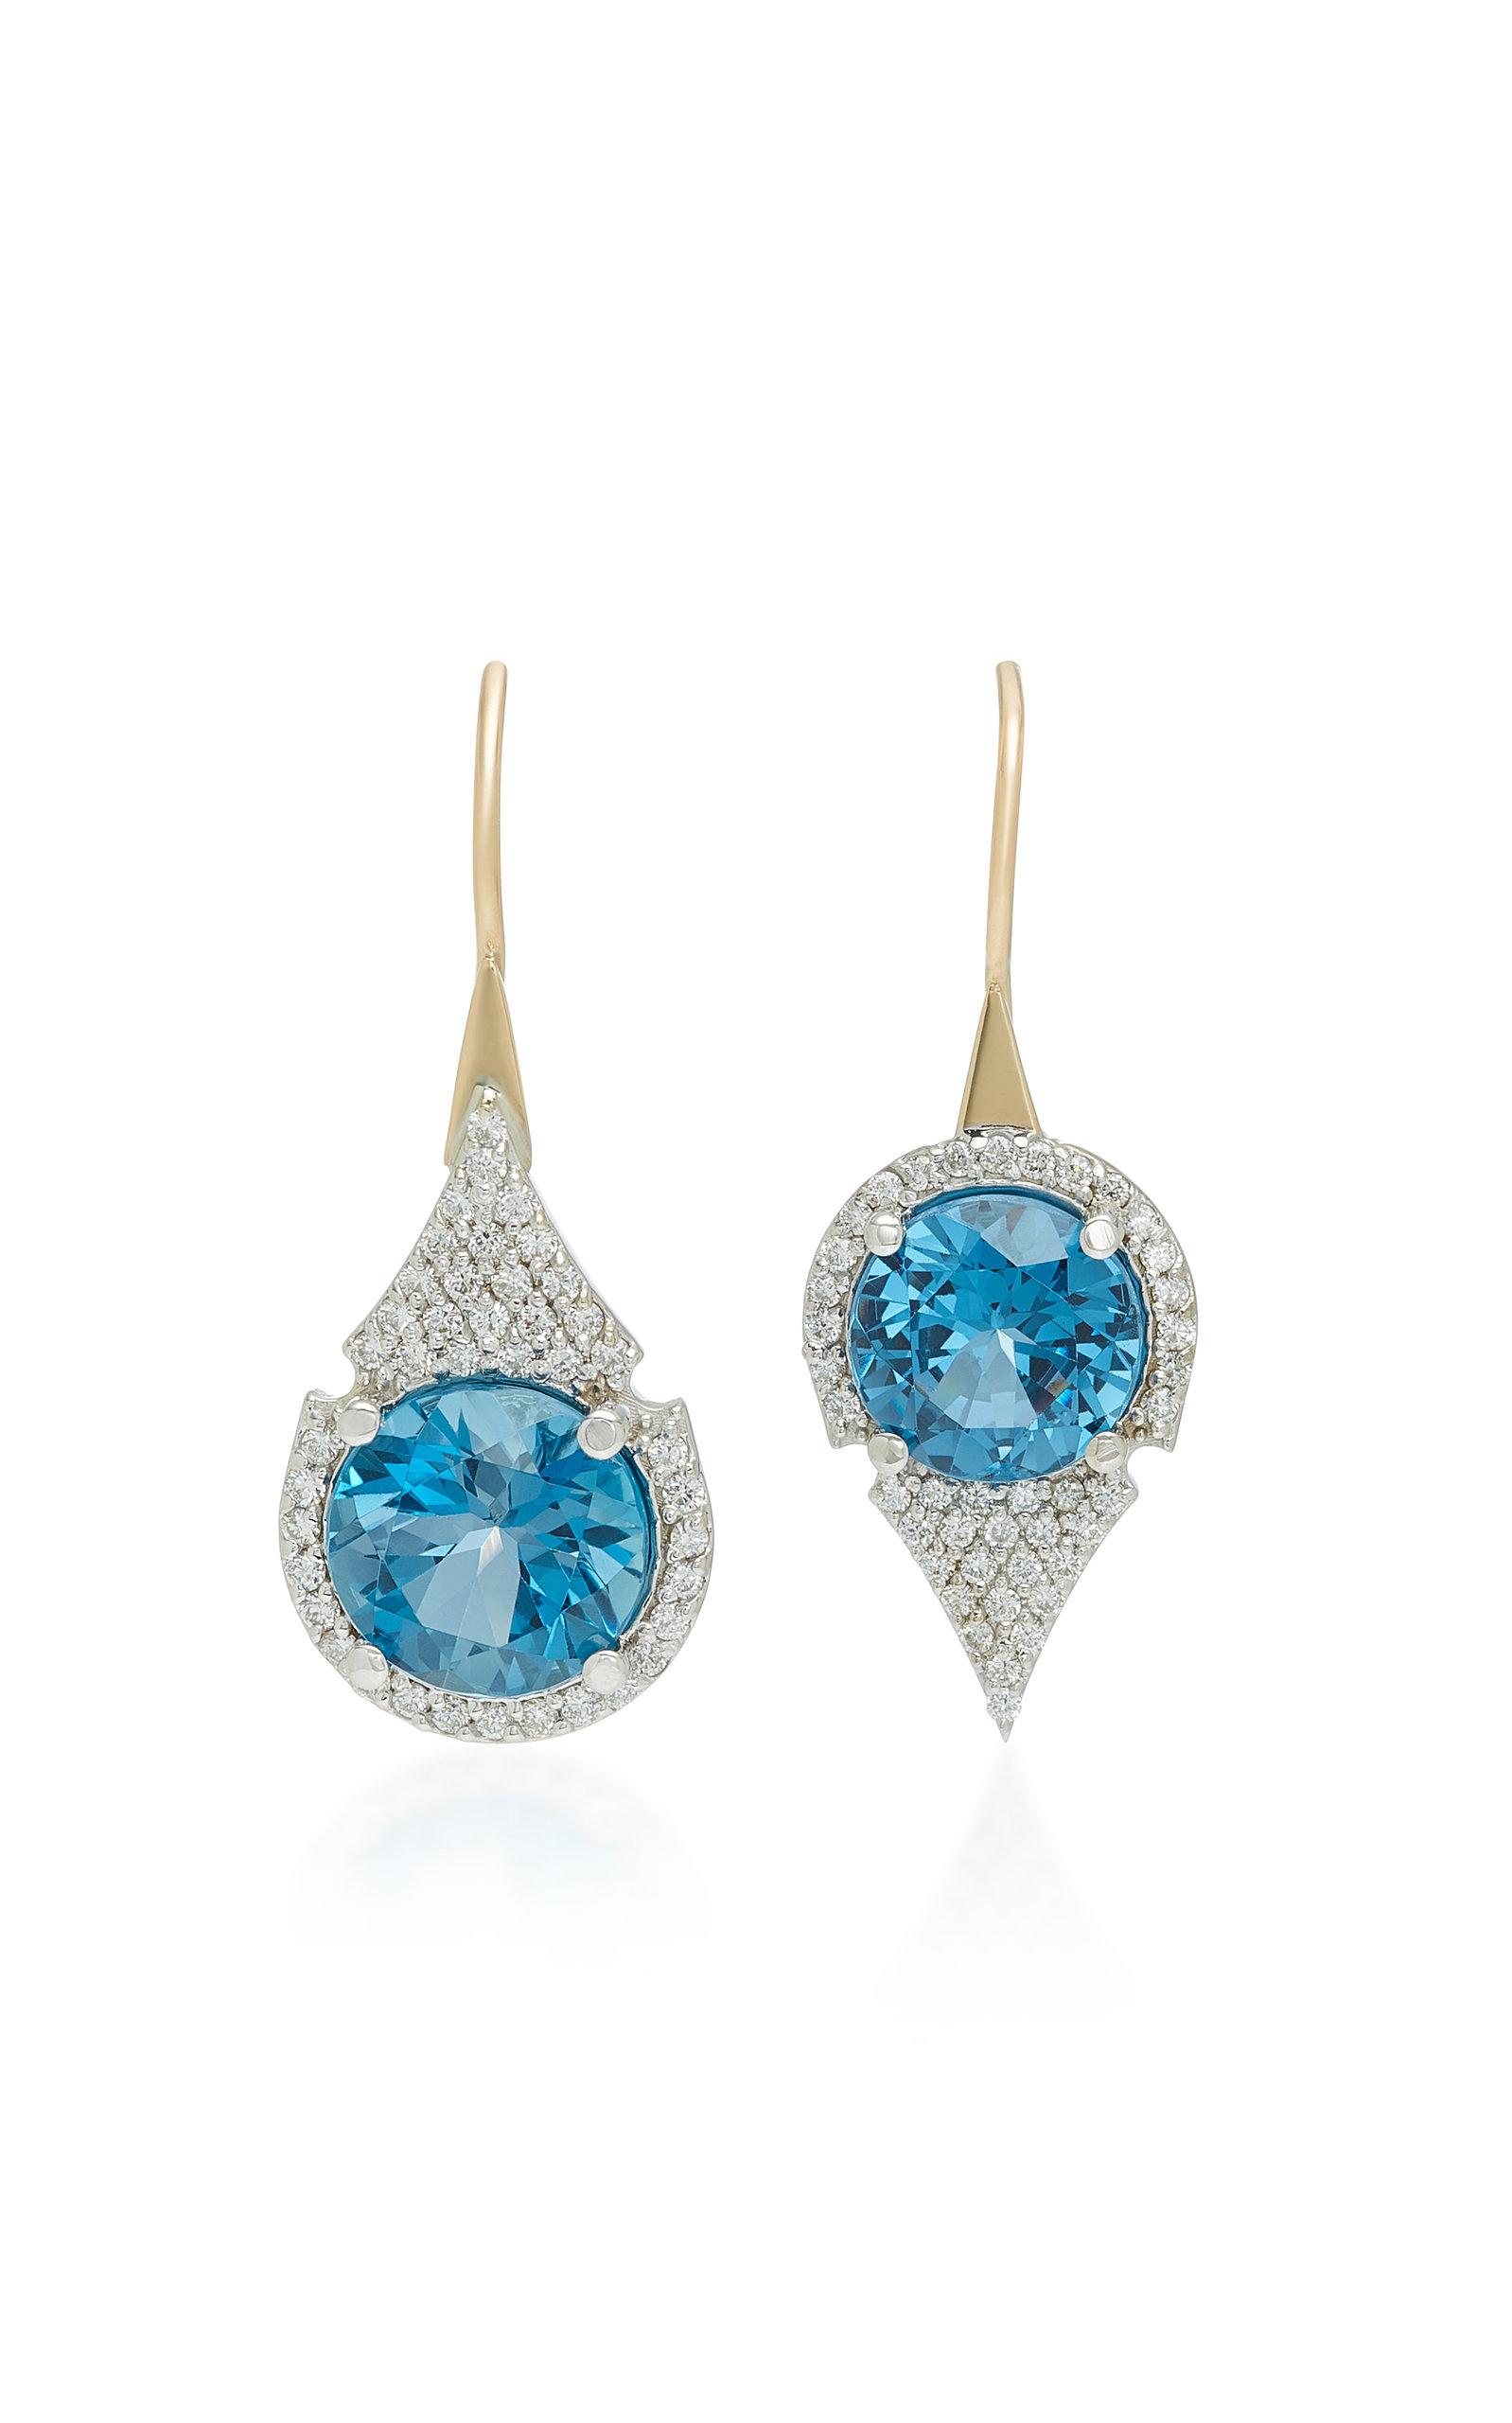 ILANA ARIEL Aziza 14K Gold Blue Topaz Diamond Earrings